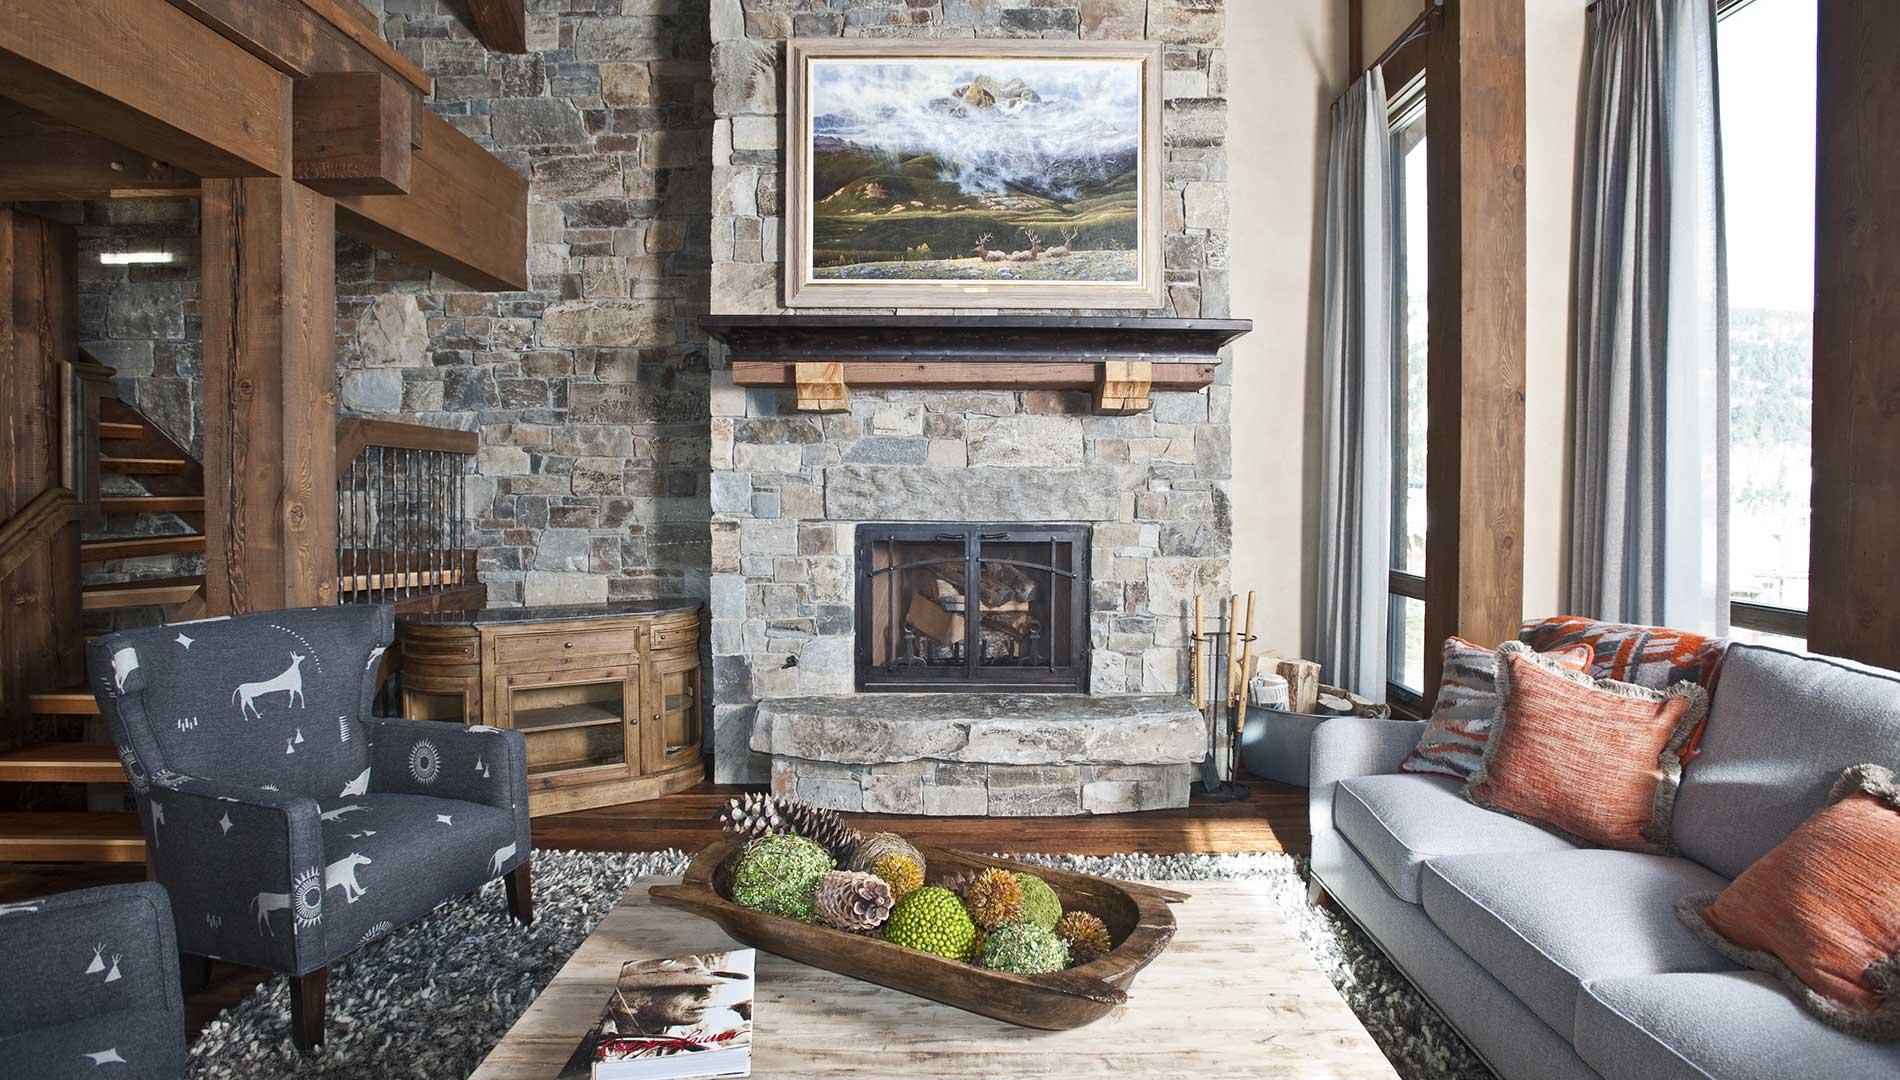 greatroom-fireplace-yellowstone-club-elizabeth-robb-interiors-1900x1080